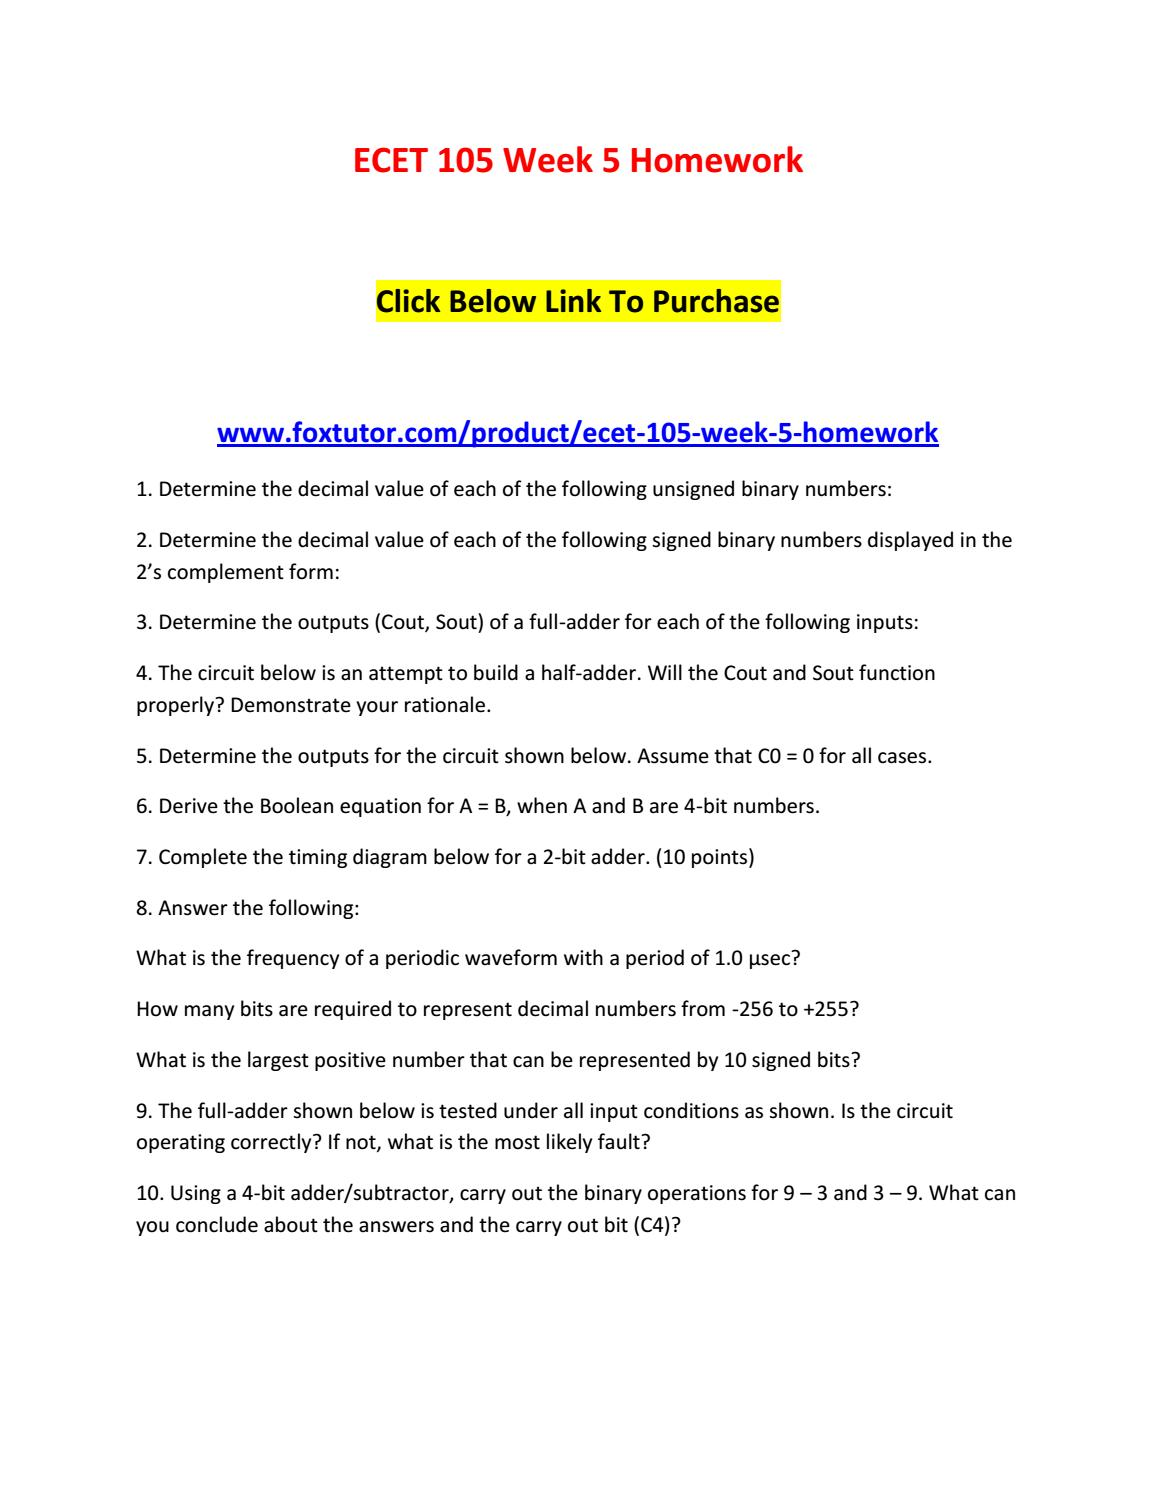 Ecet 105 Week 5 Homework By Ecet105ft